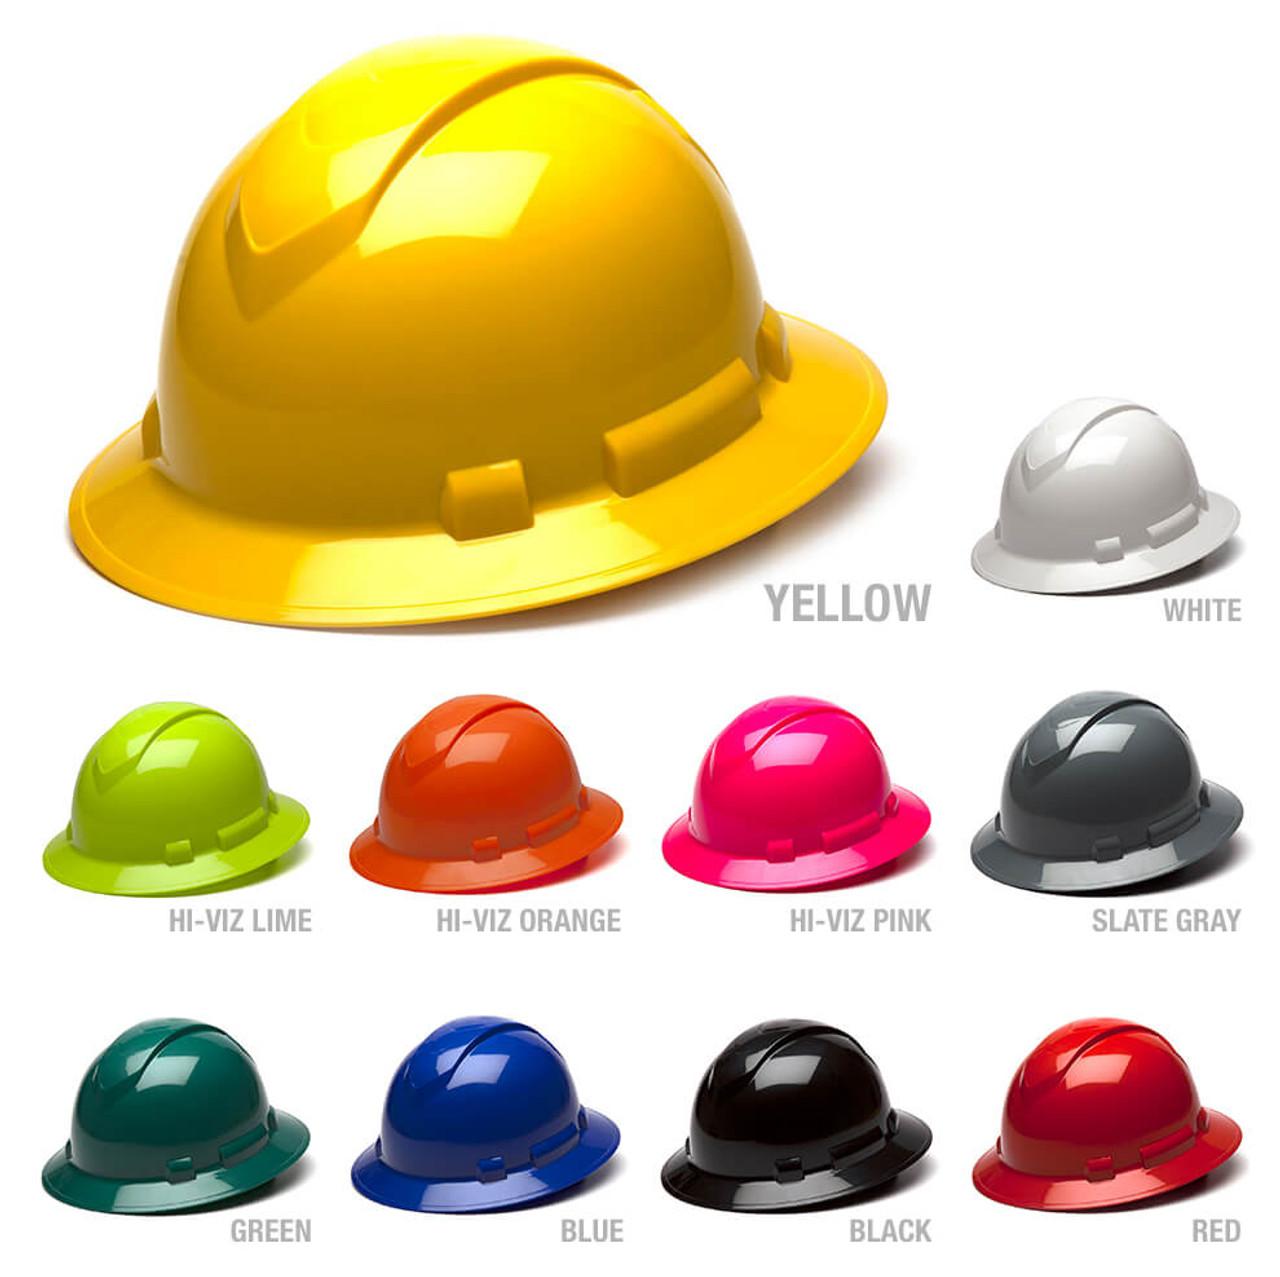 Pyramex Ridgeline Full Brim Hard Hat Hi-Vis Lime 4-Point Ratchet Suspension